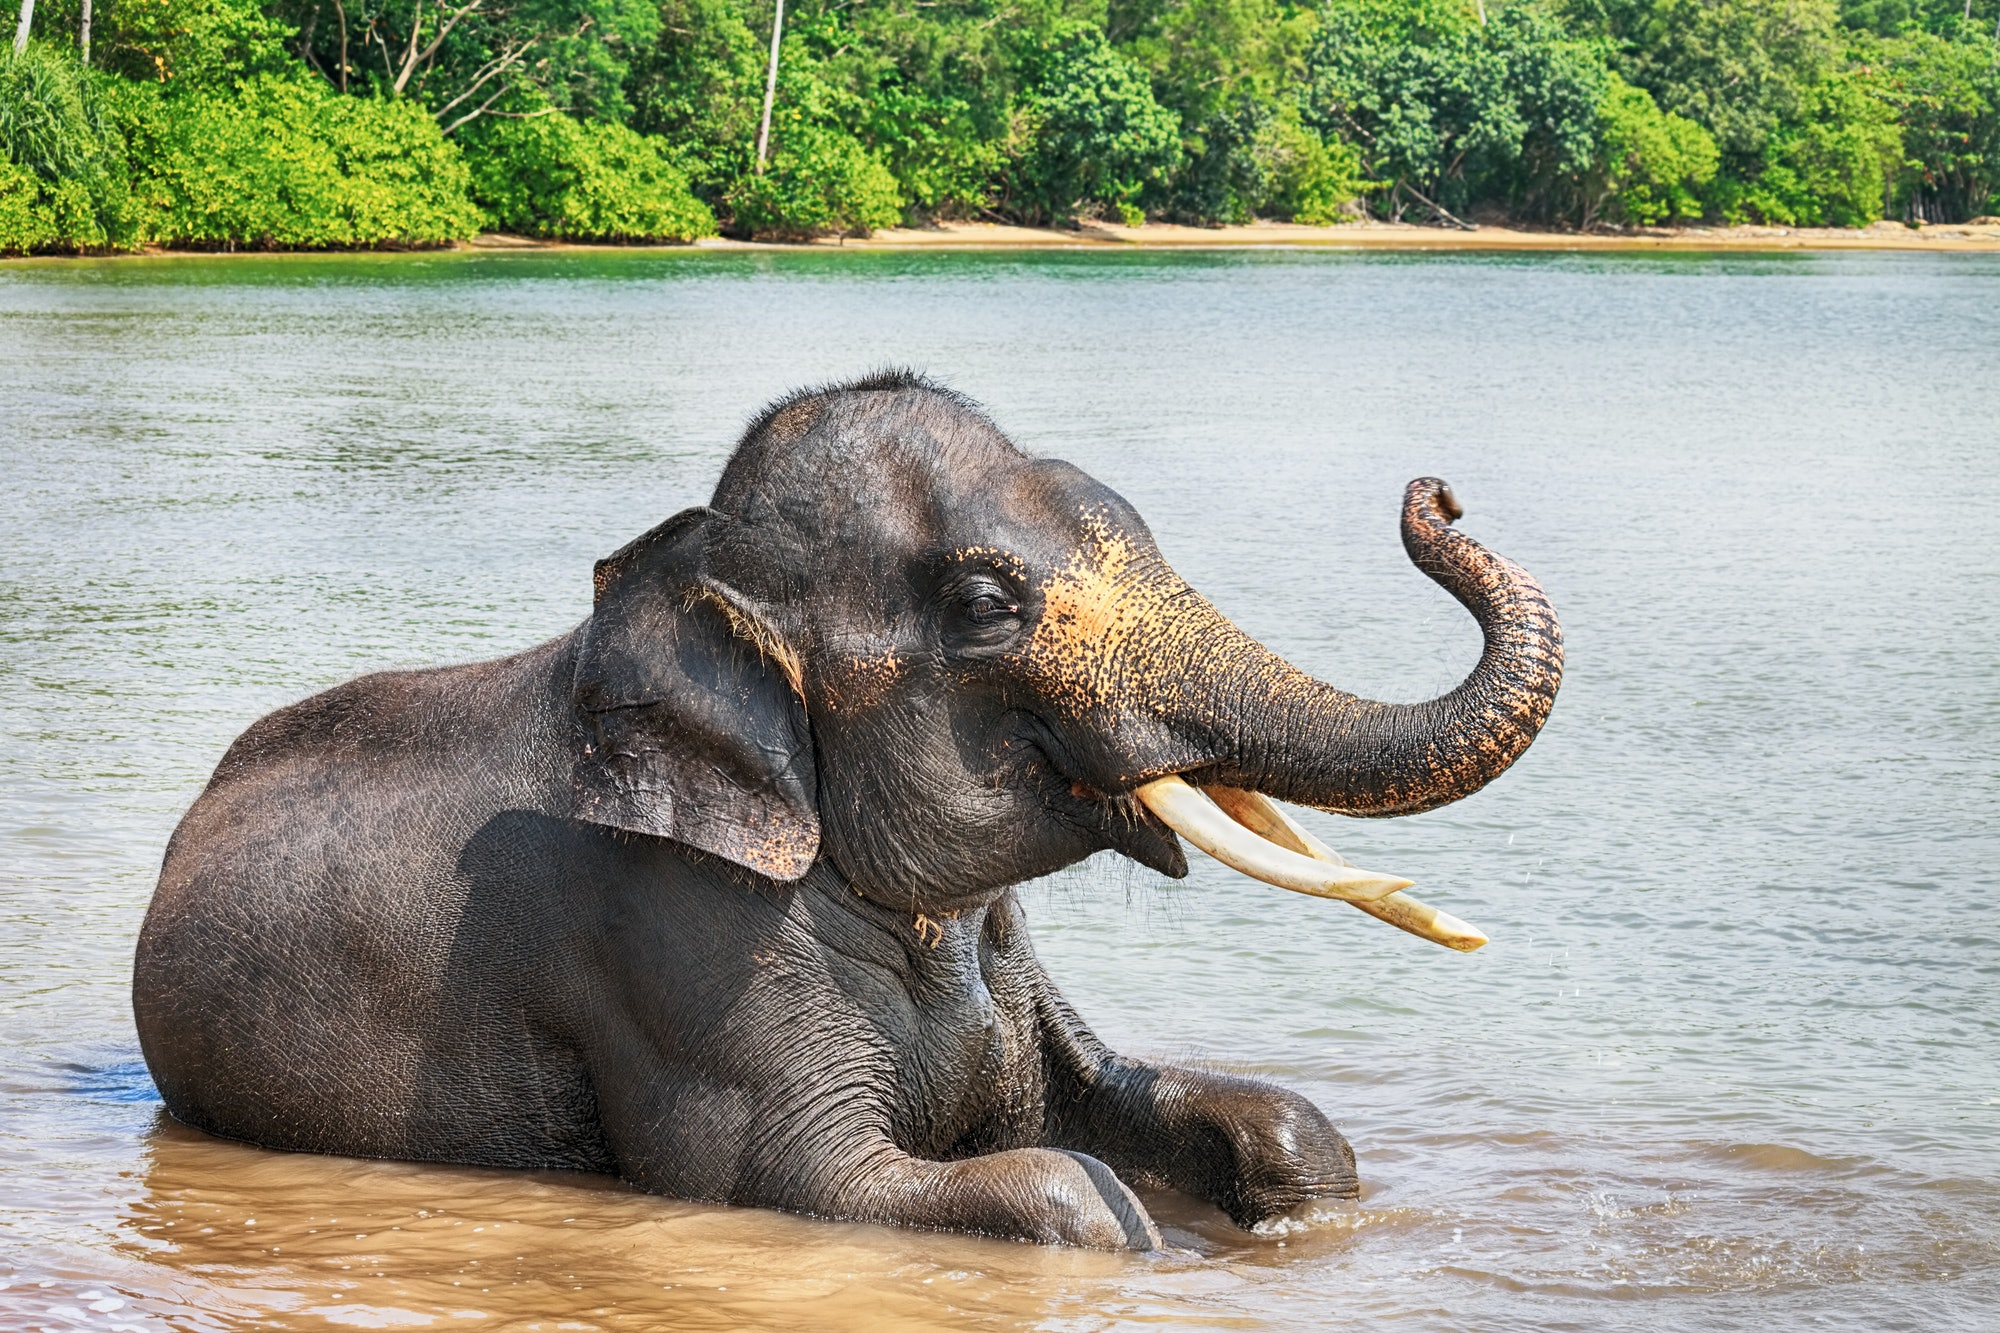 Sumatran elephant lying in sea with its trunk raised,  Bintan, Indonesia.